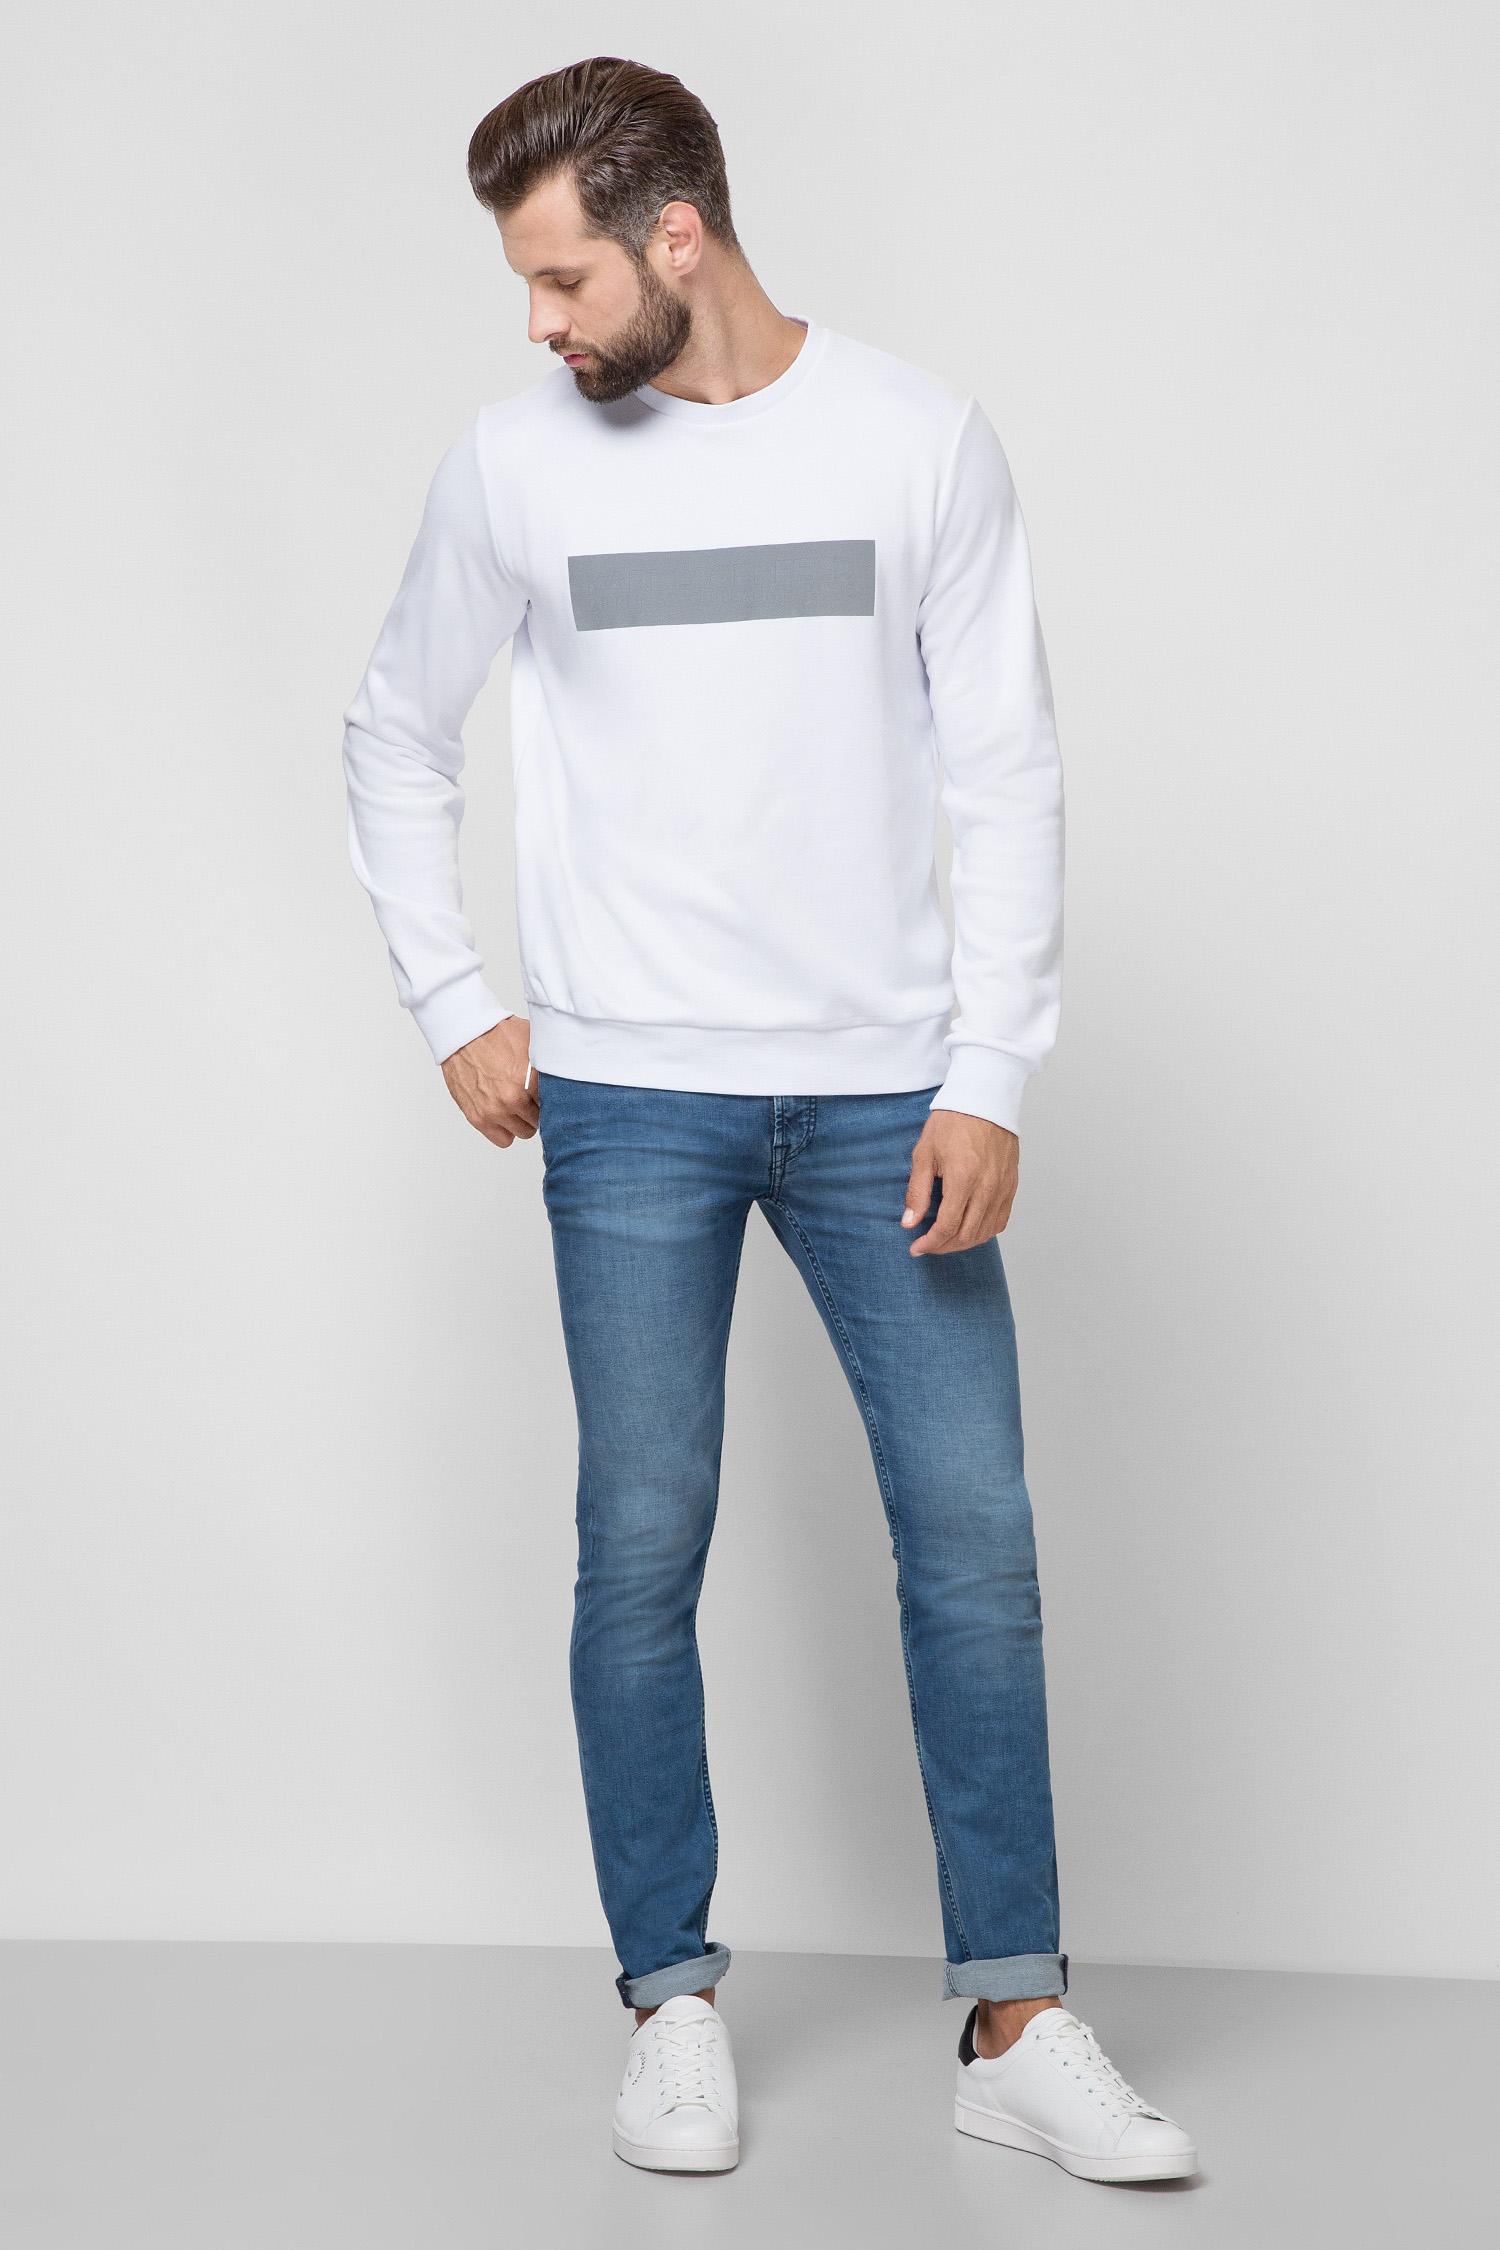 Мужской белый свитшот Karl Lagerfeld 501900.705023;10